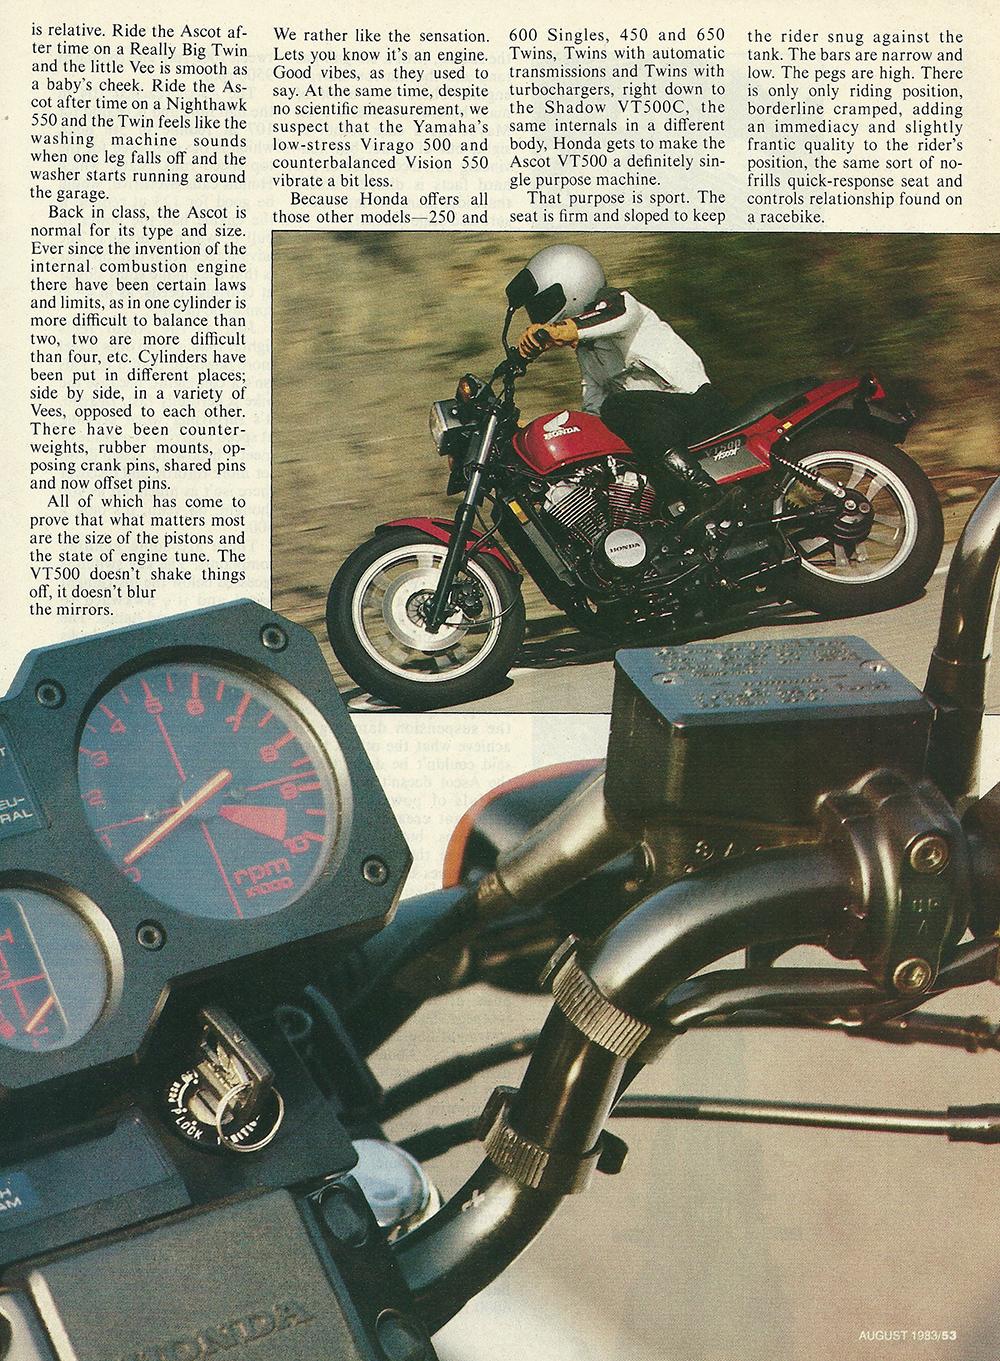 1983 Honda VT500 Ascot road test 2 04.JPG